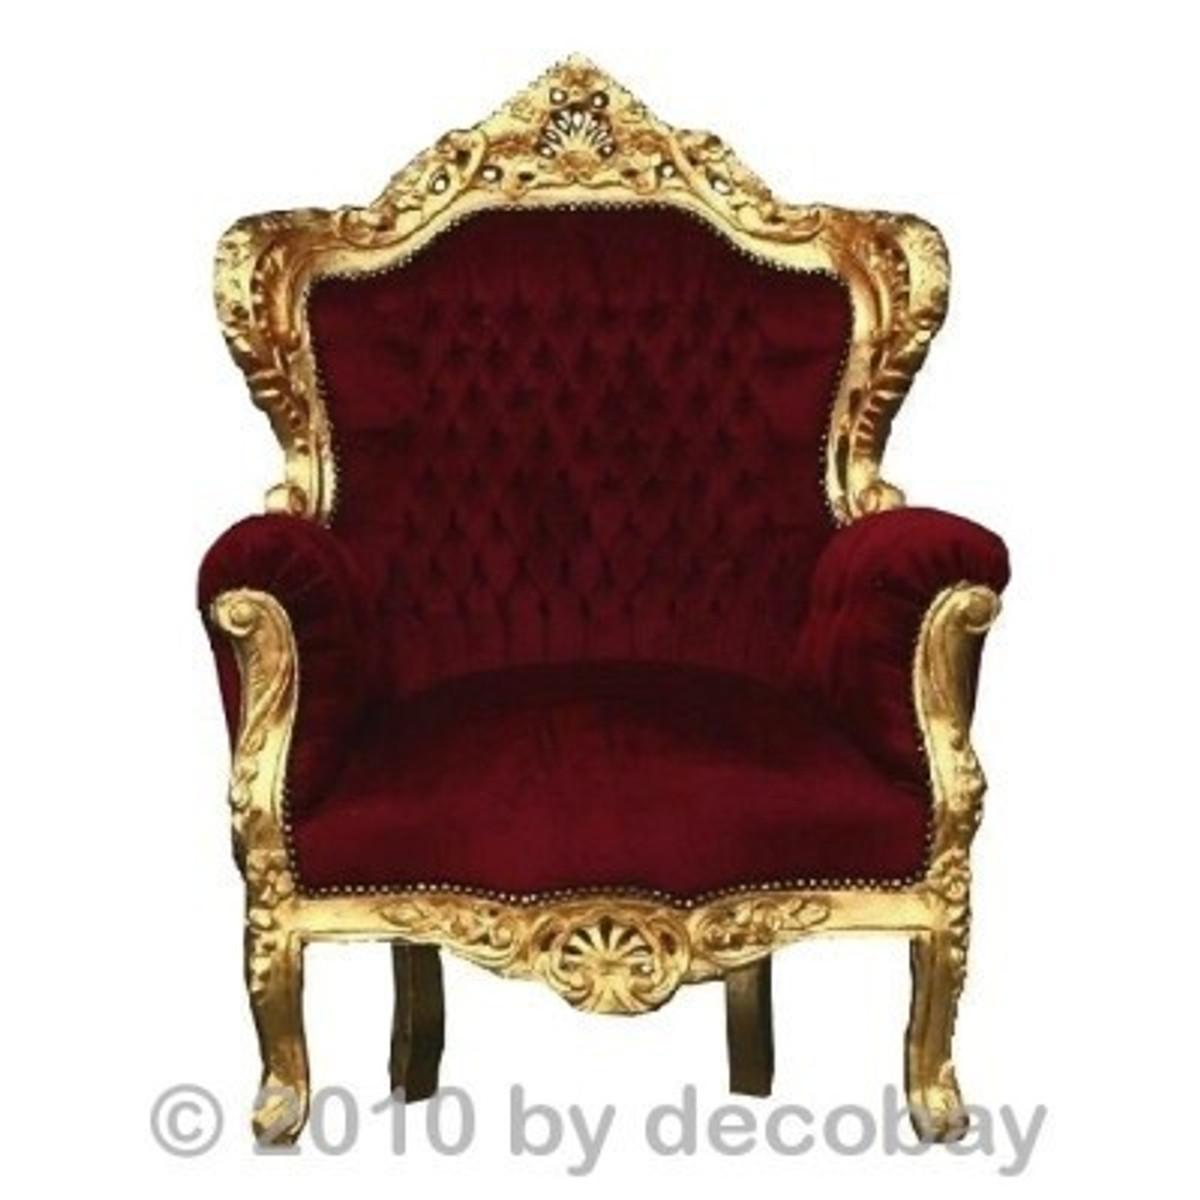 Wohnzimmermöbel Aus Holz Barock Sessel Sofa Antik SPARSET Rot Gold ANGEBOT  ...